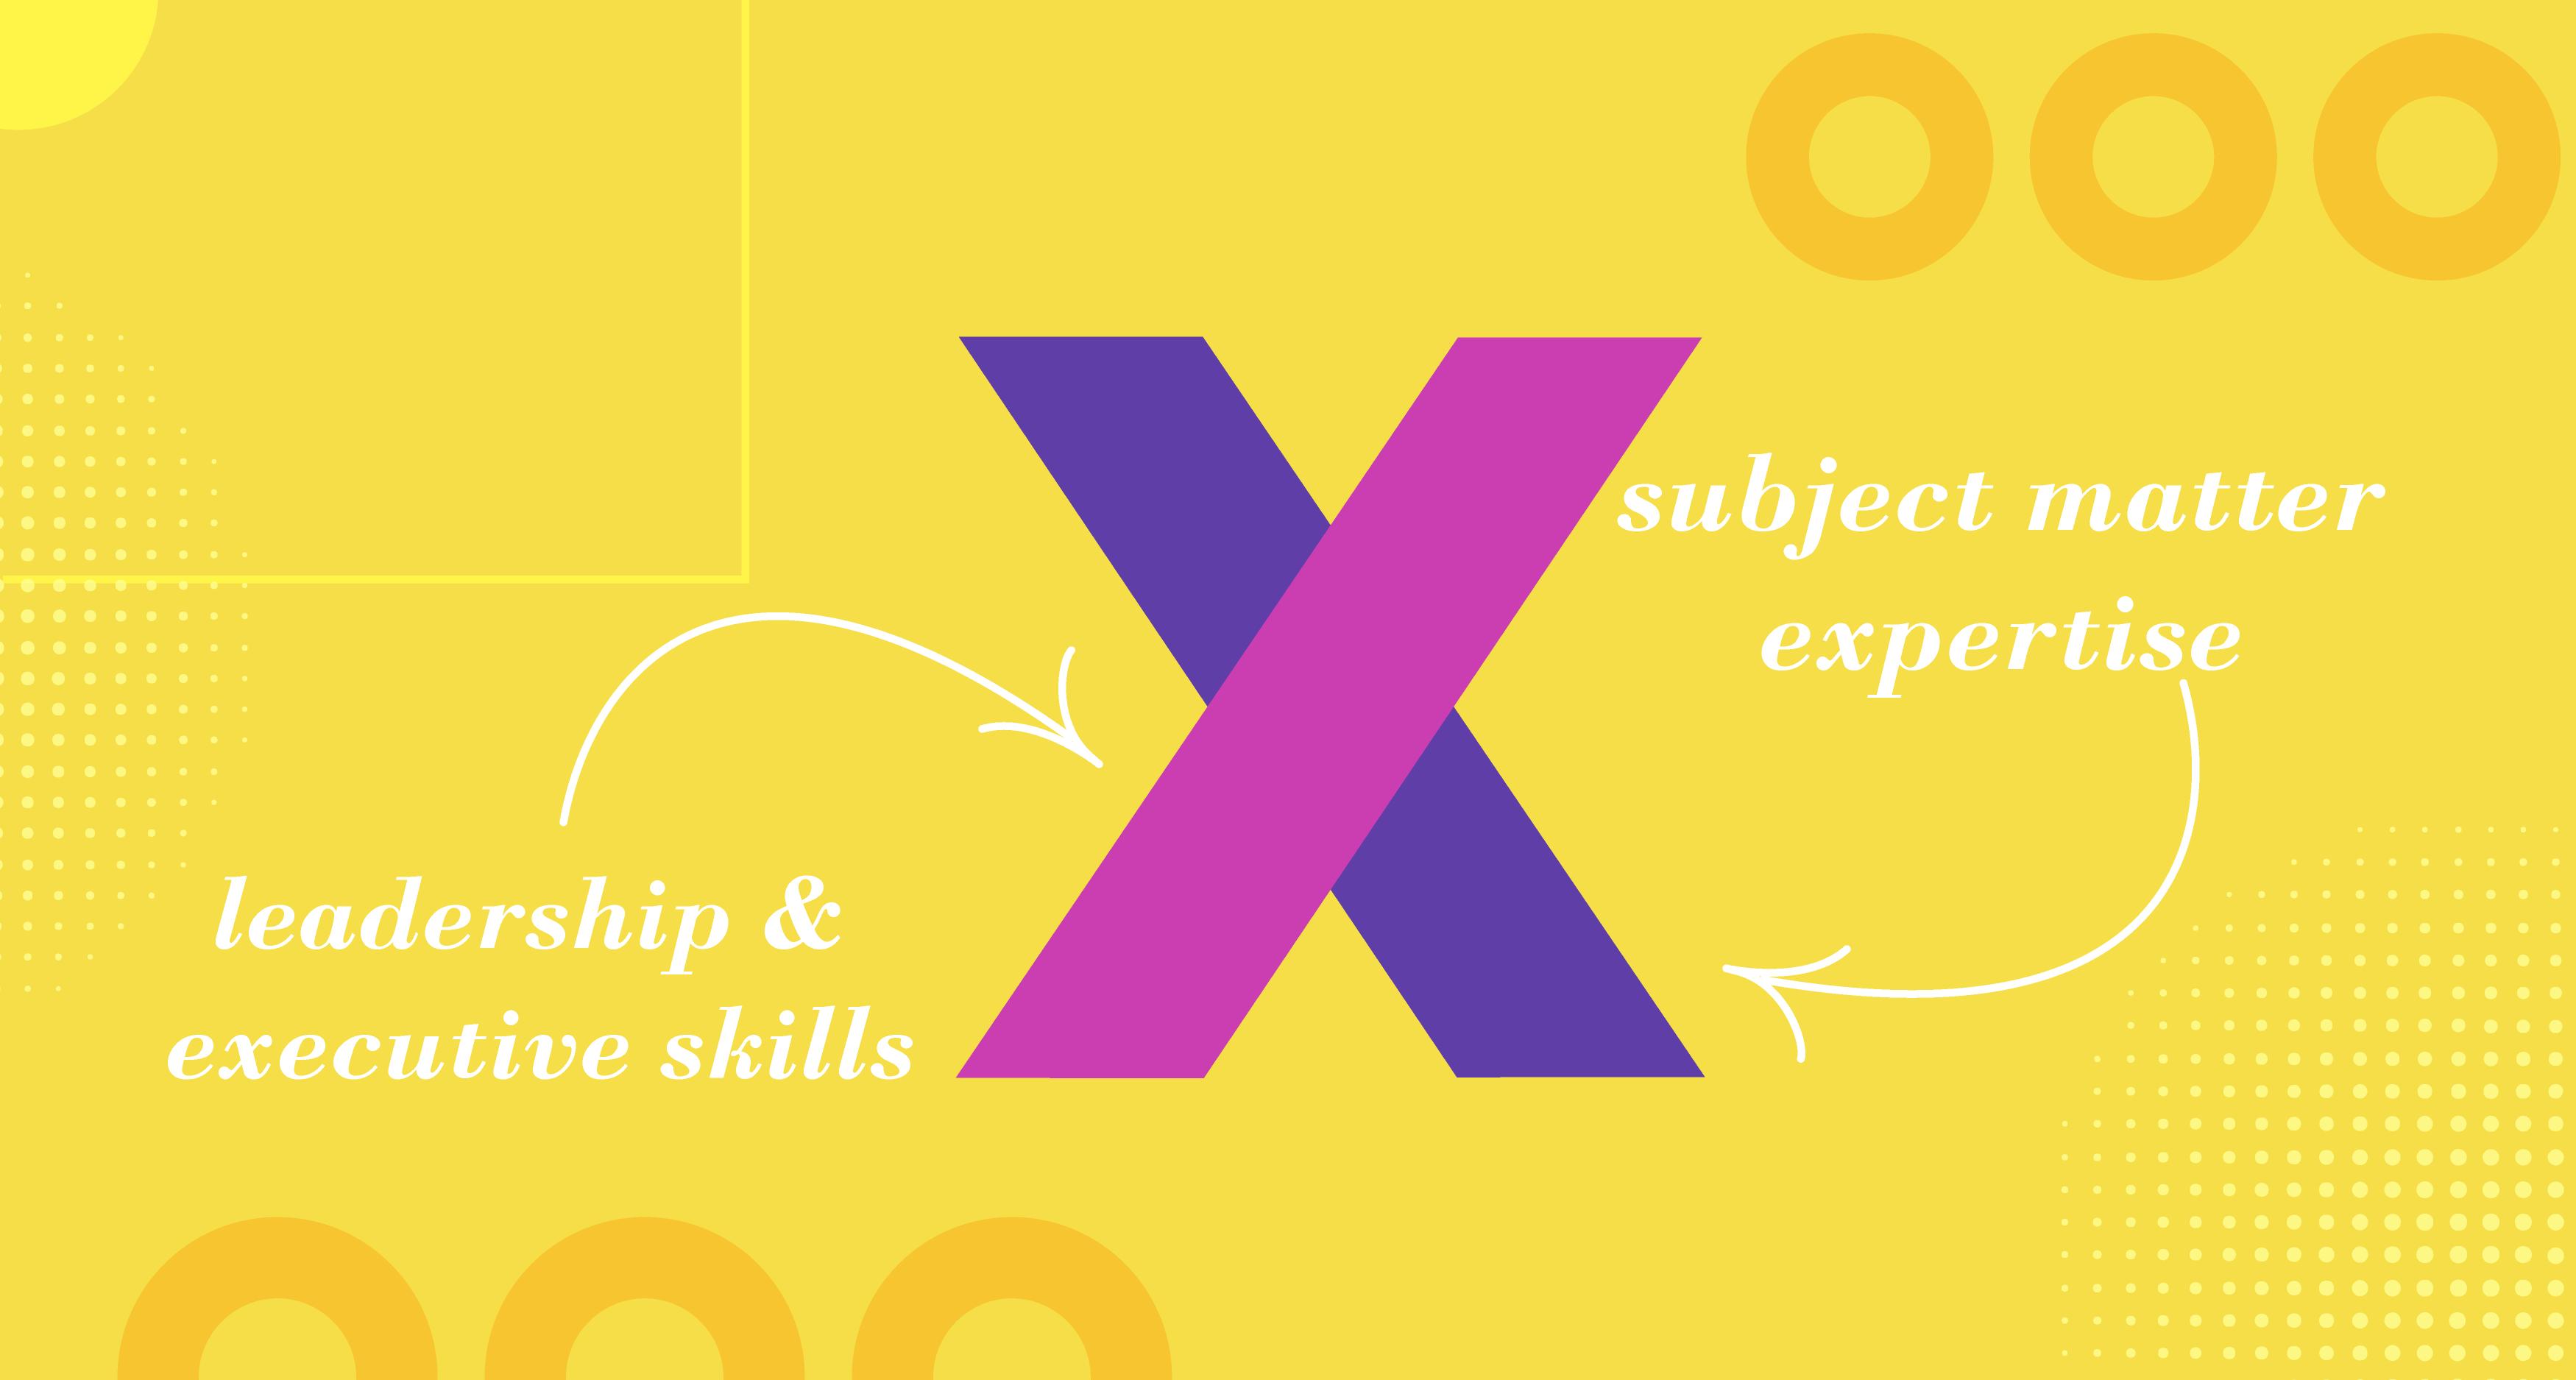 От I-shaped до X-shaped: как рынок заставляет PM-ов эволюционировать 3